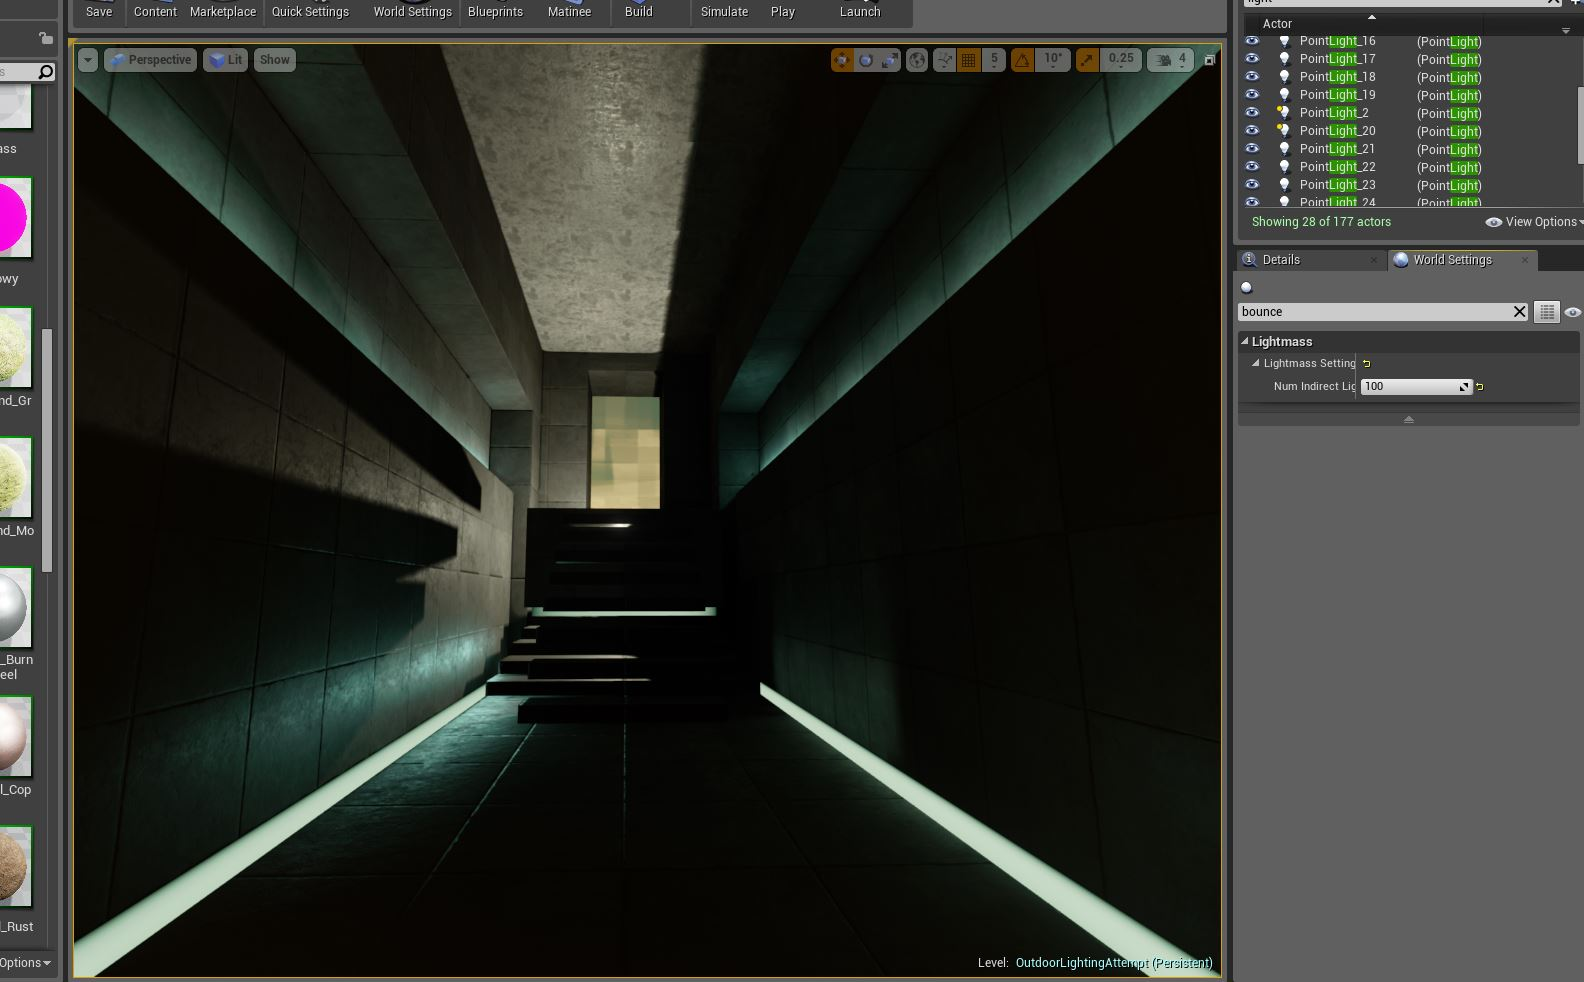 Better floor mat & indirect lighting 100